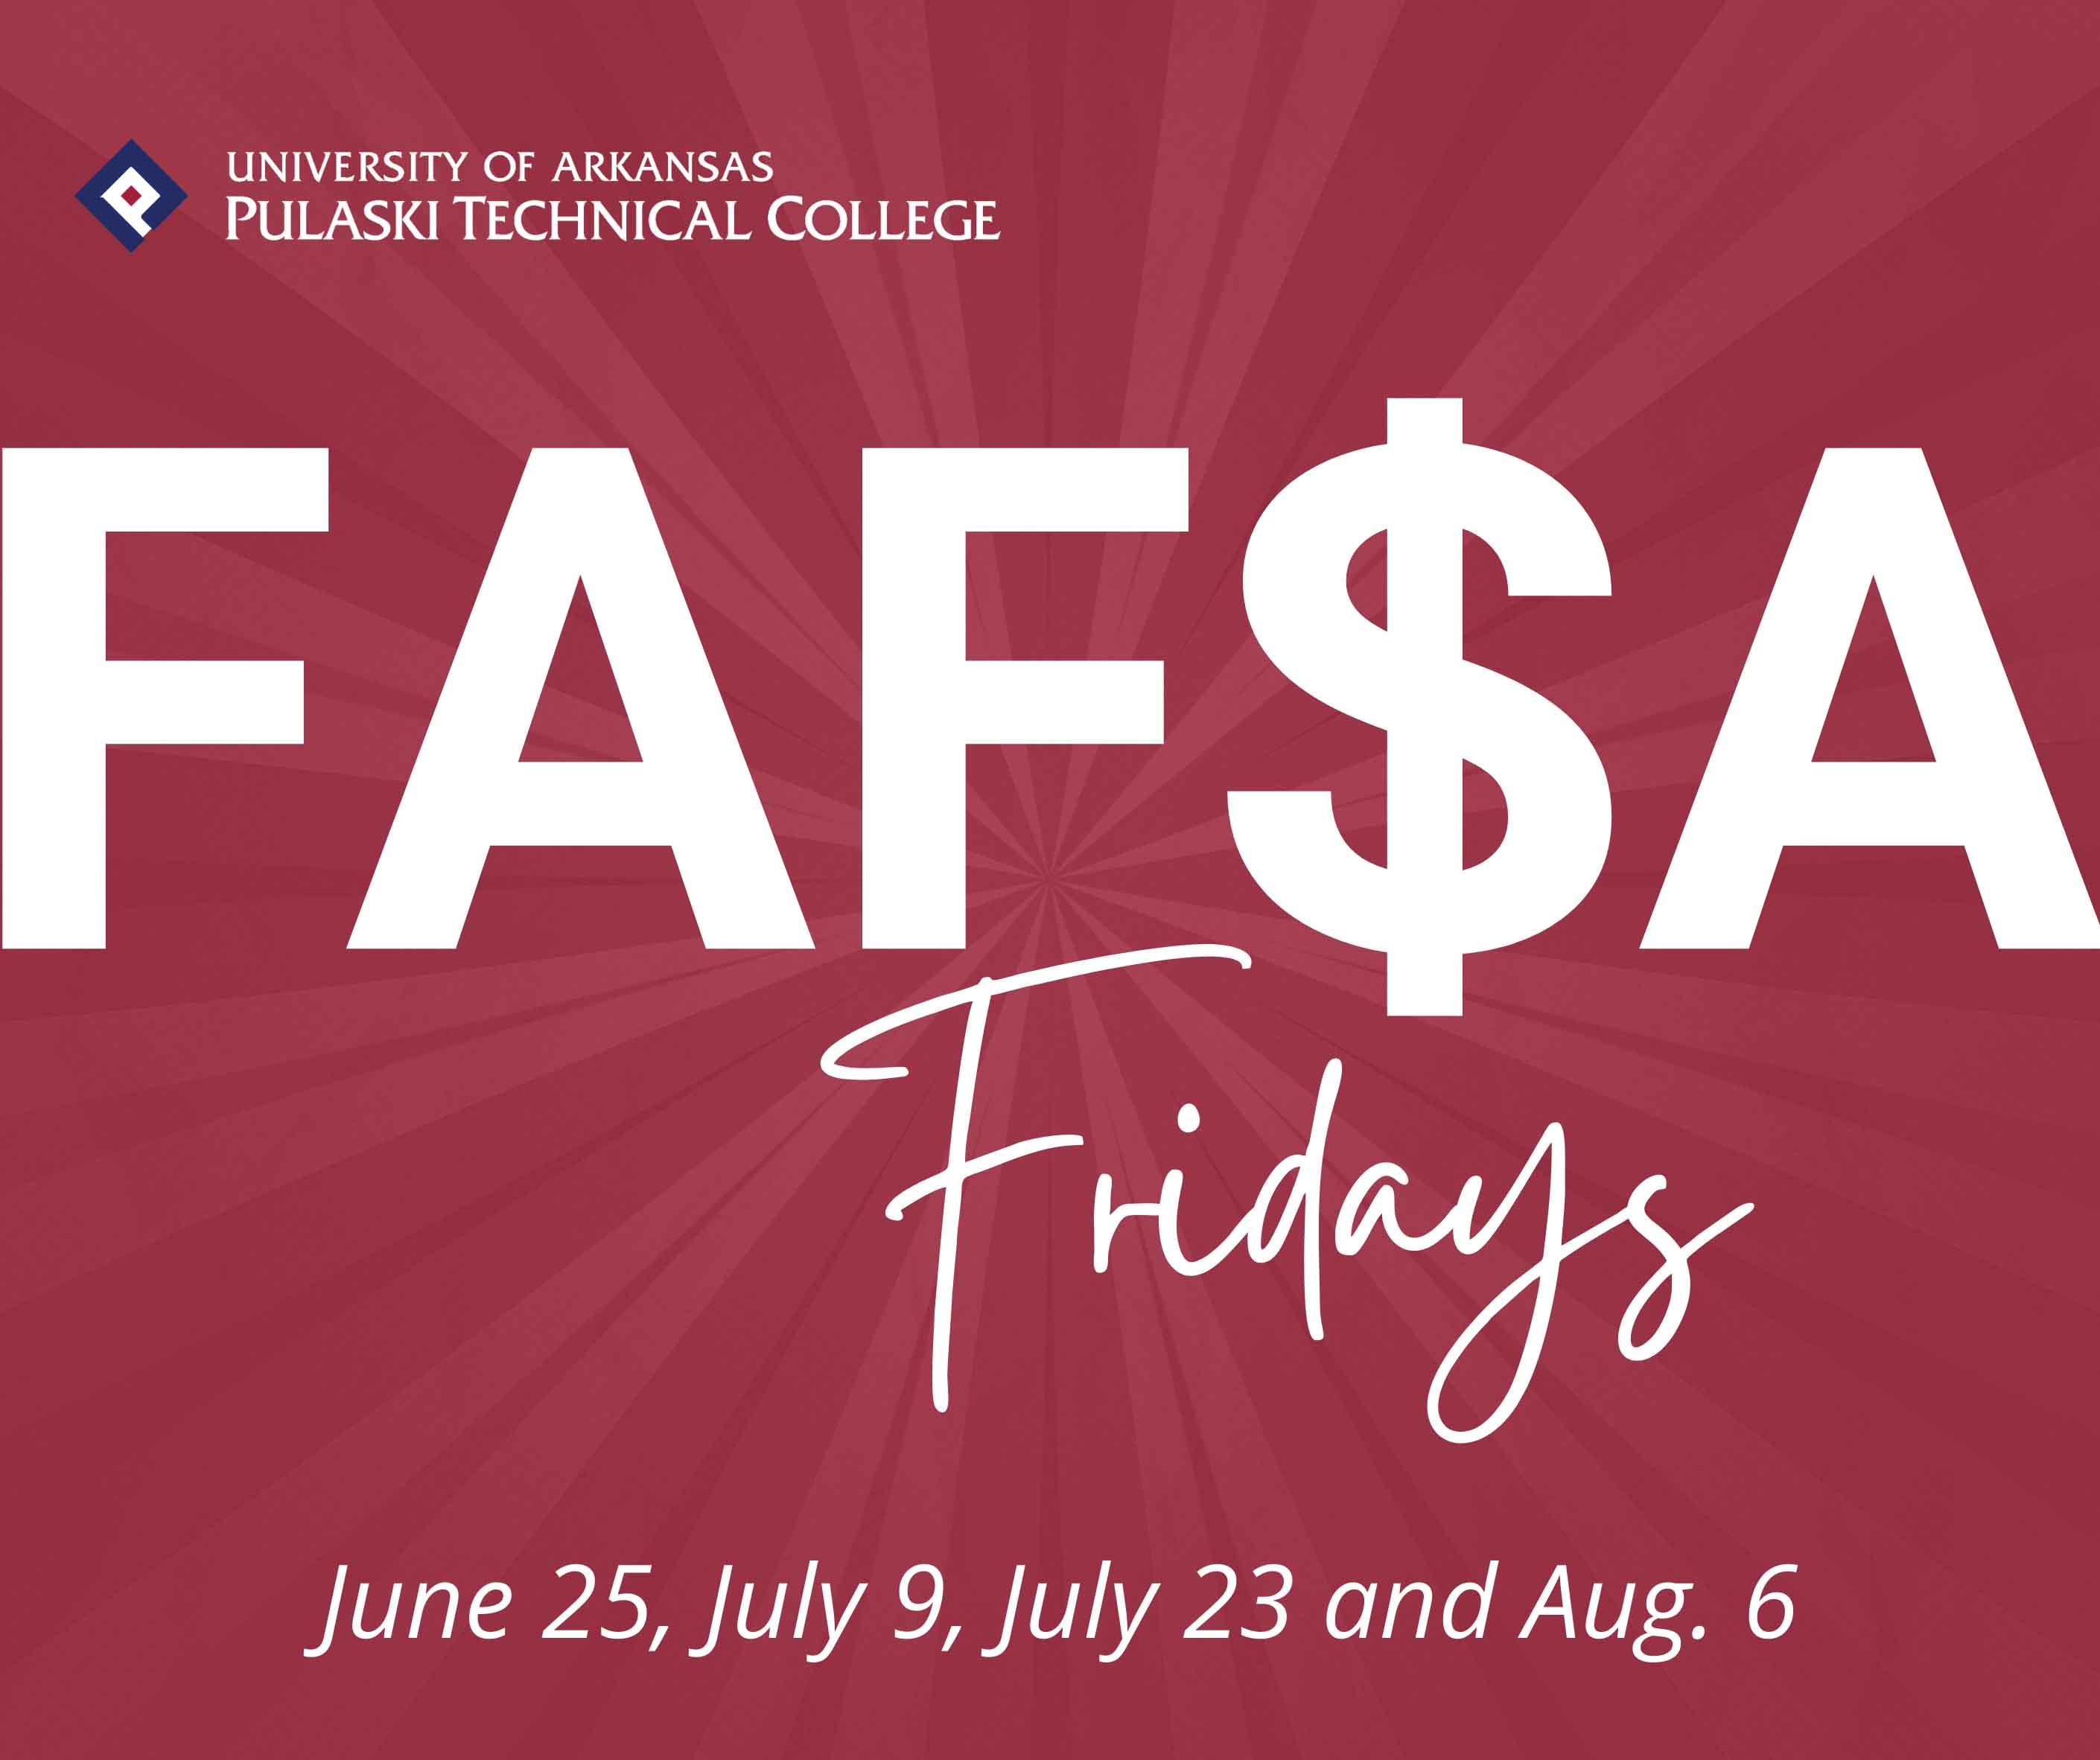 UA-PTC FAFSA Fridays